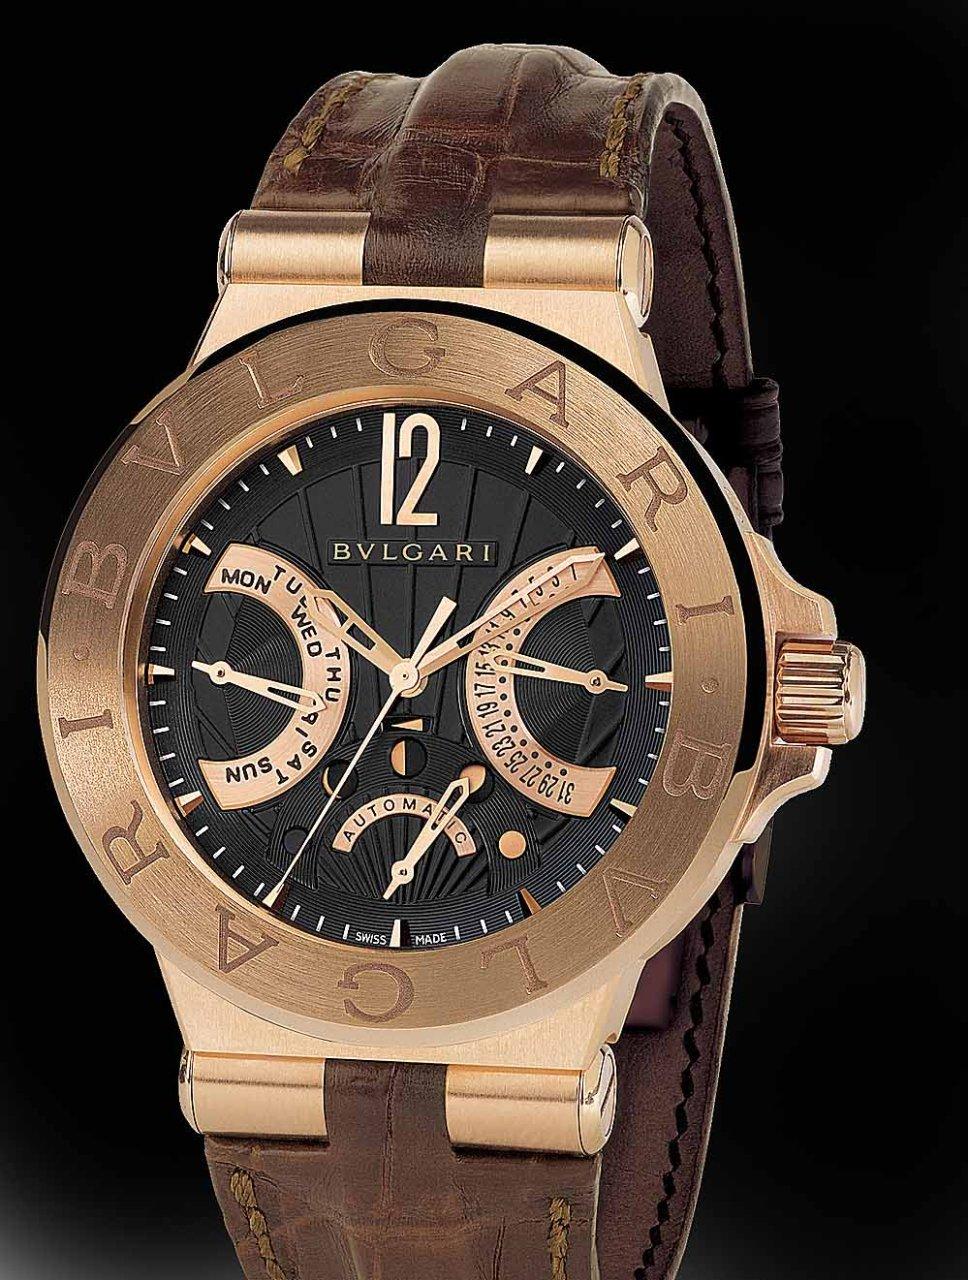 0b08e70b02d3 reloj bvlgari ironman precio